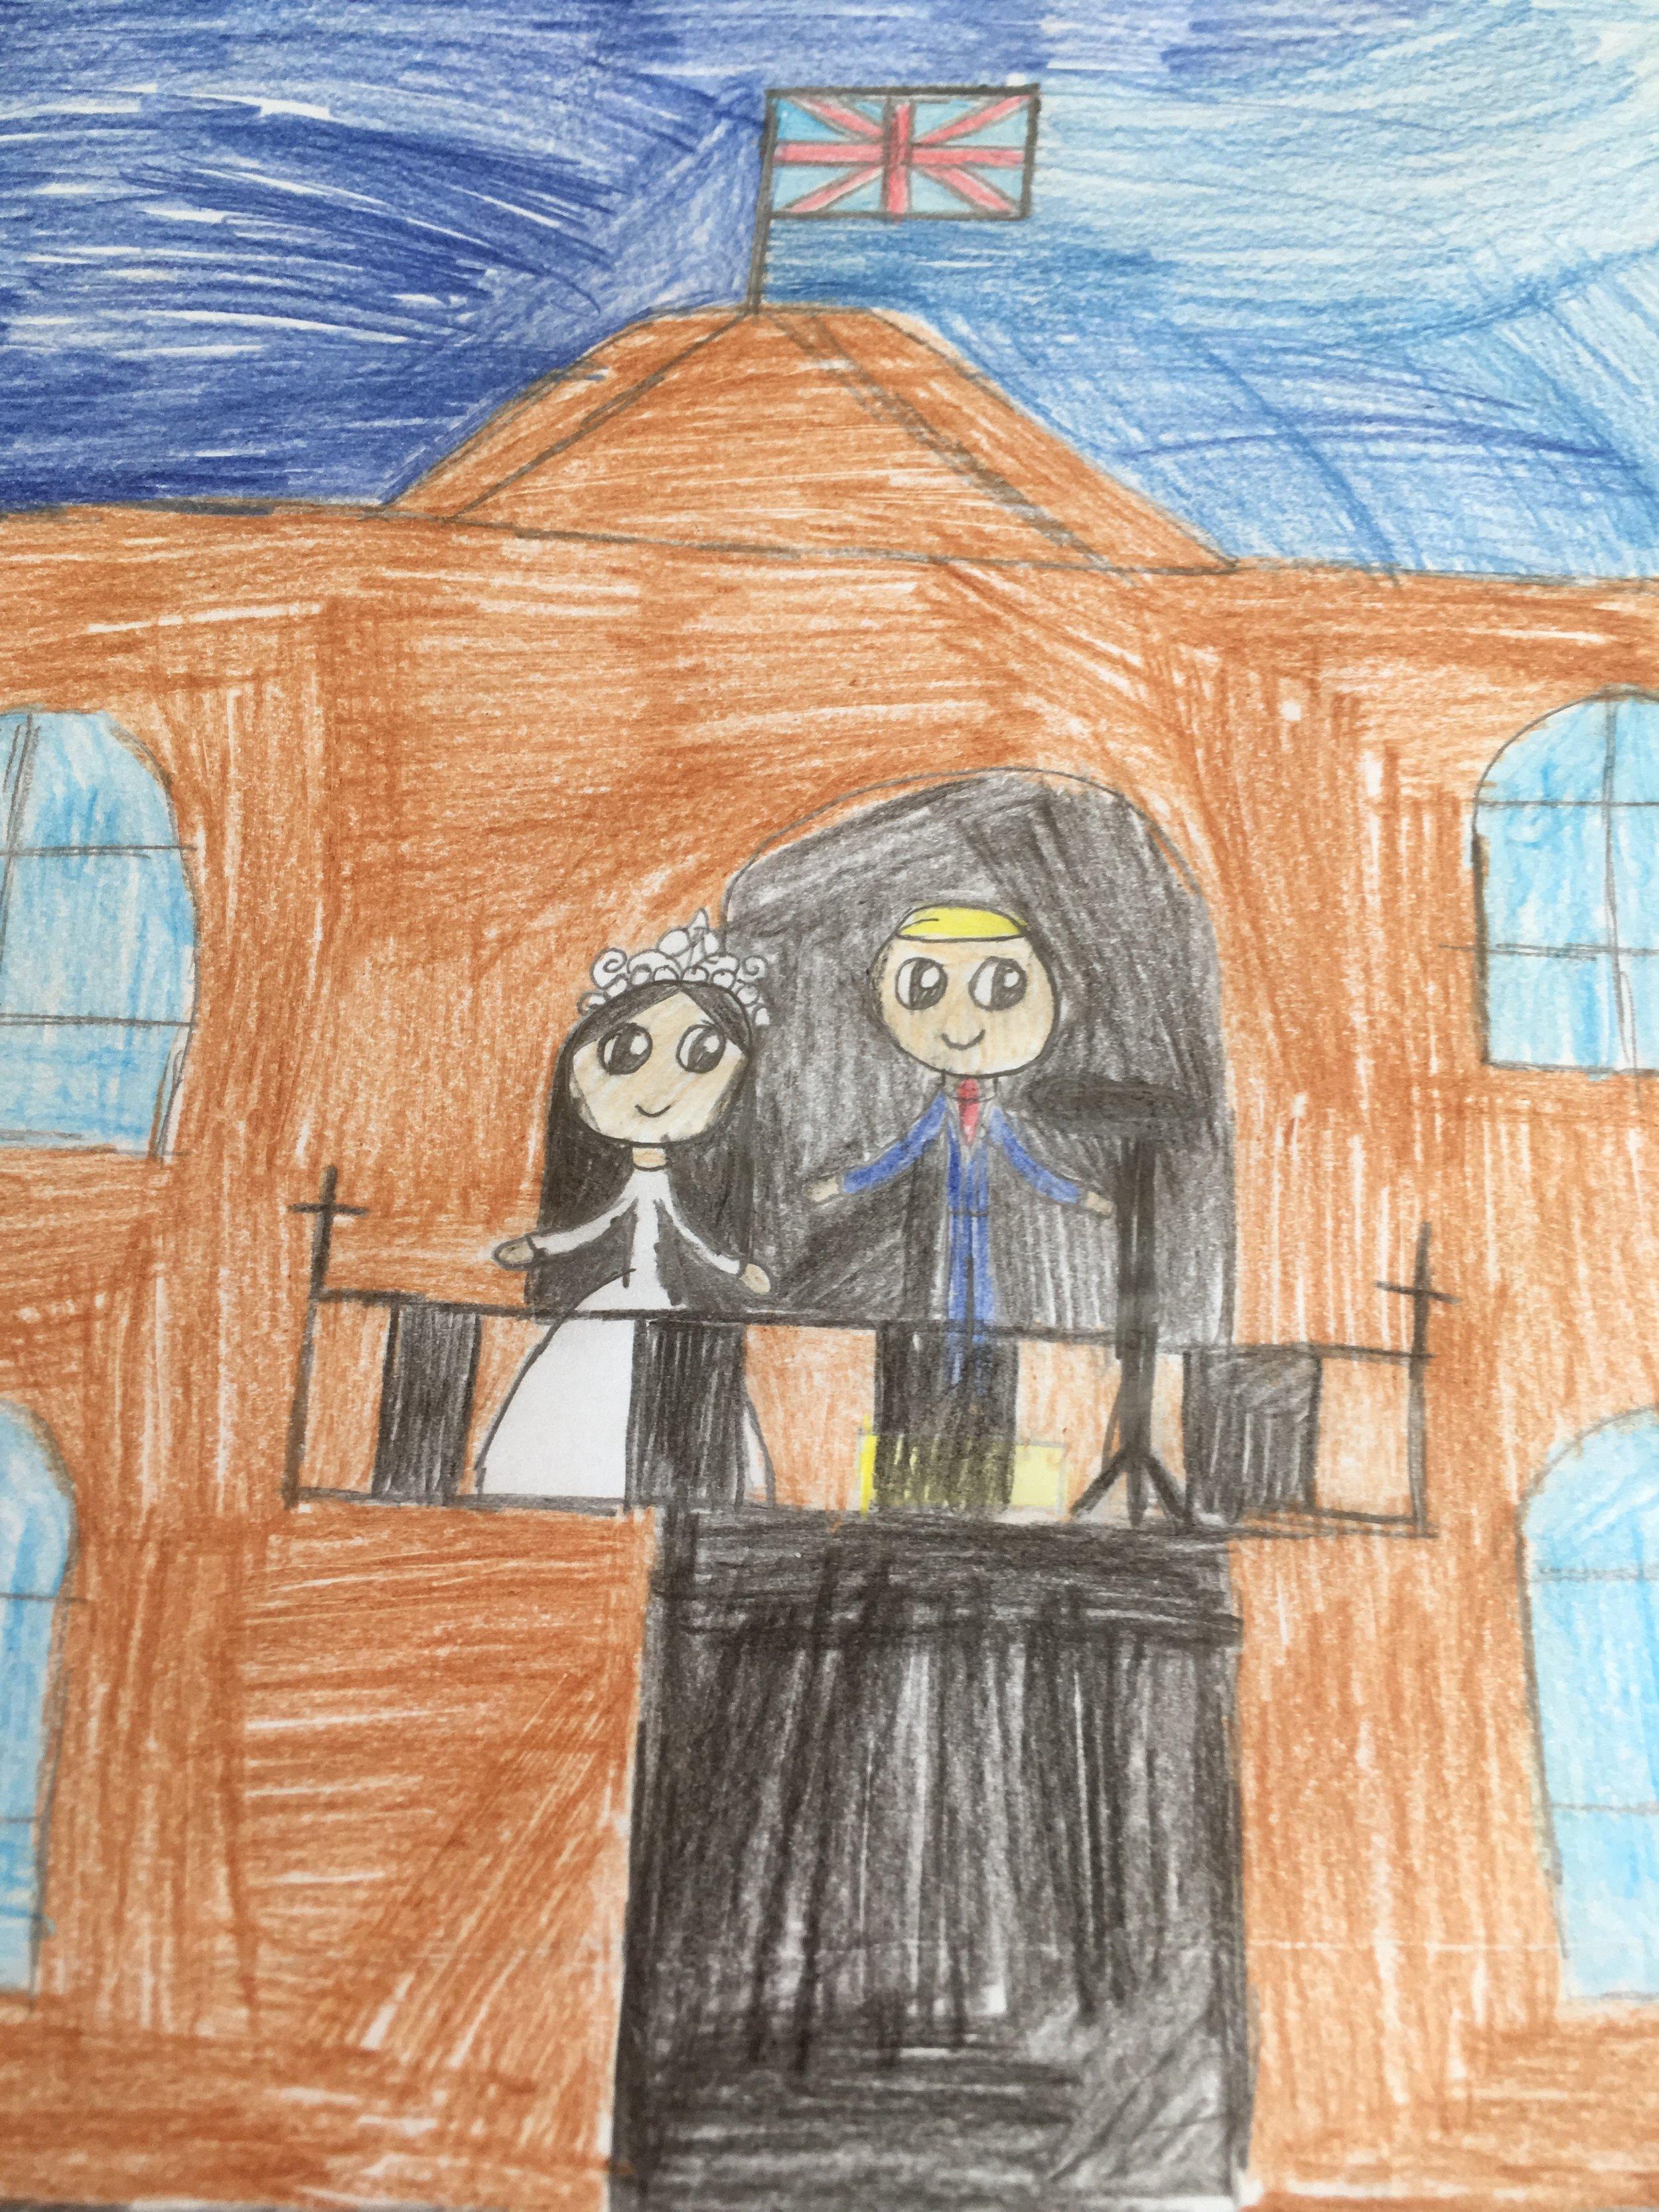 Harry and Meghan balcony